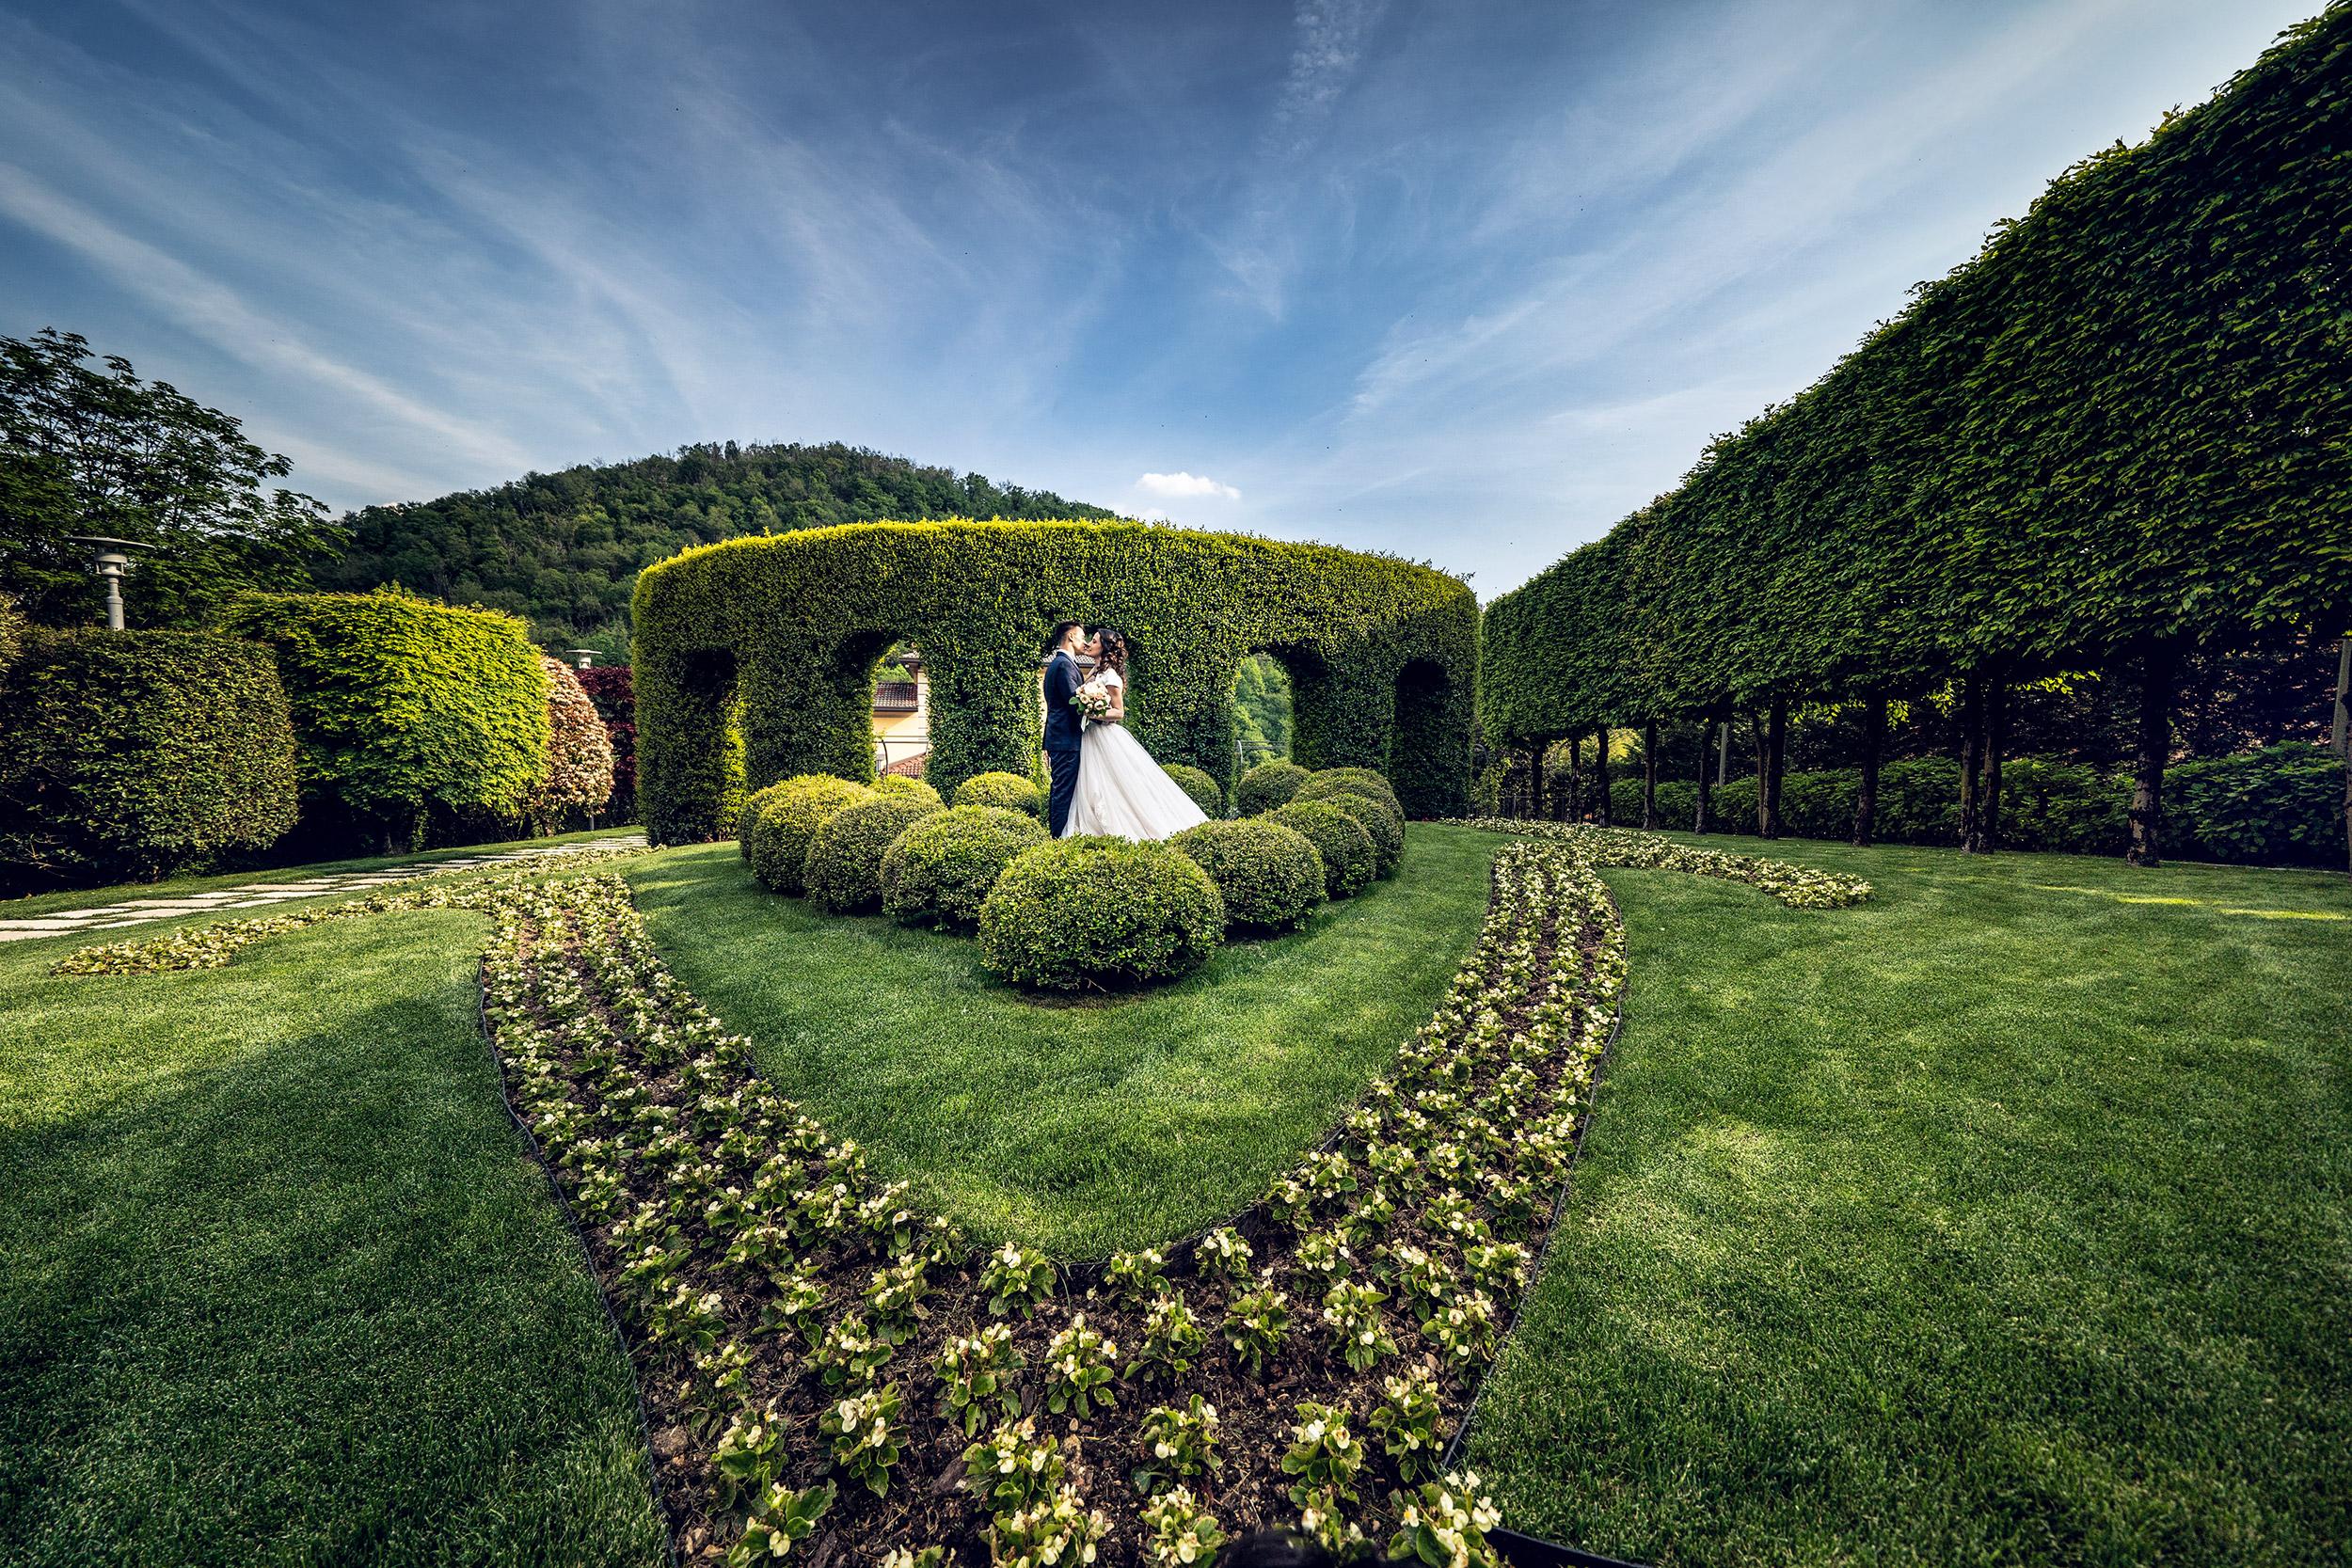 001 sposi matrimonio wedding reportage la palma palazzago bergamo